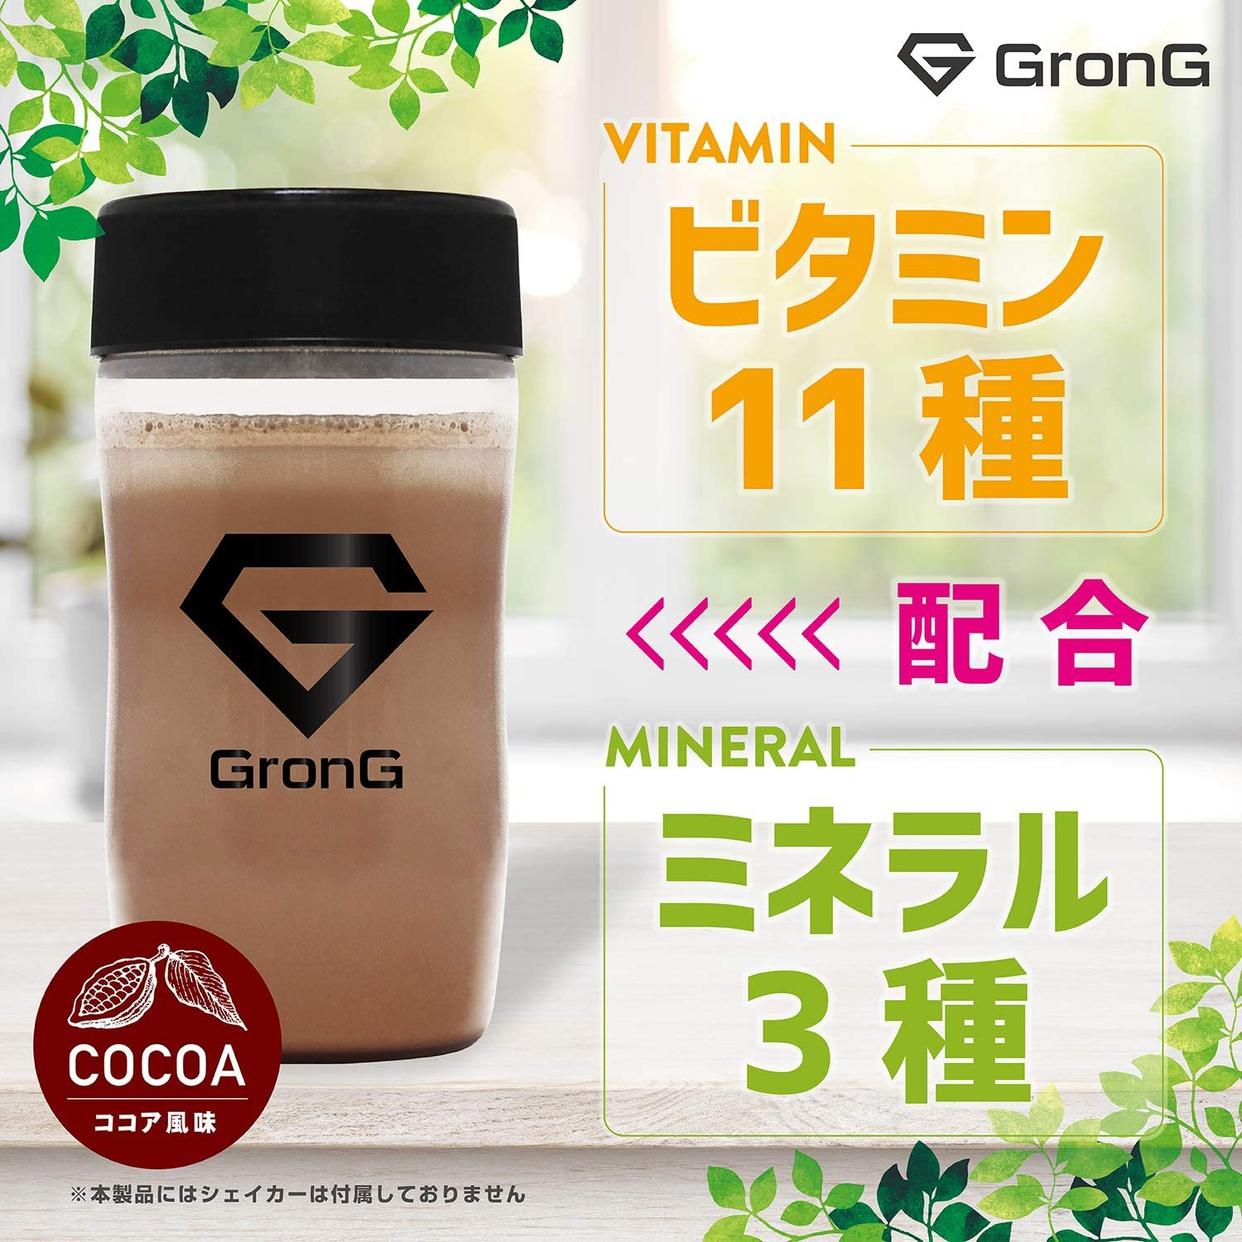 GronG(グロング) ジュニアプロテインの商品画像3